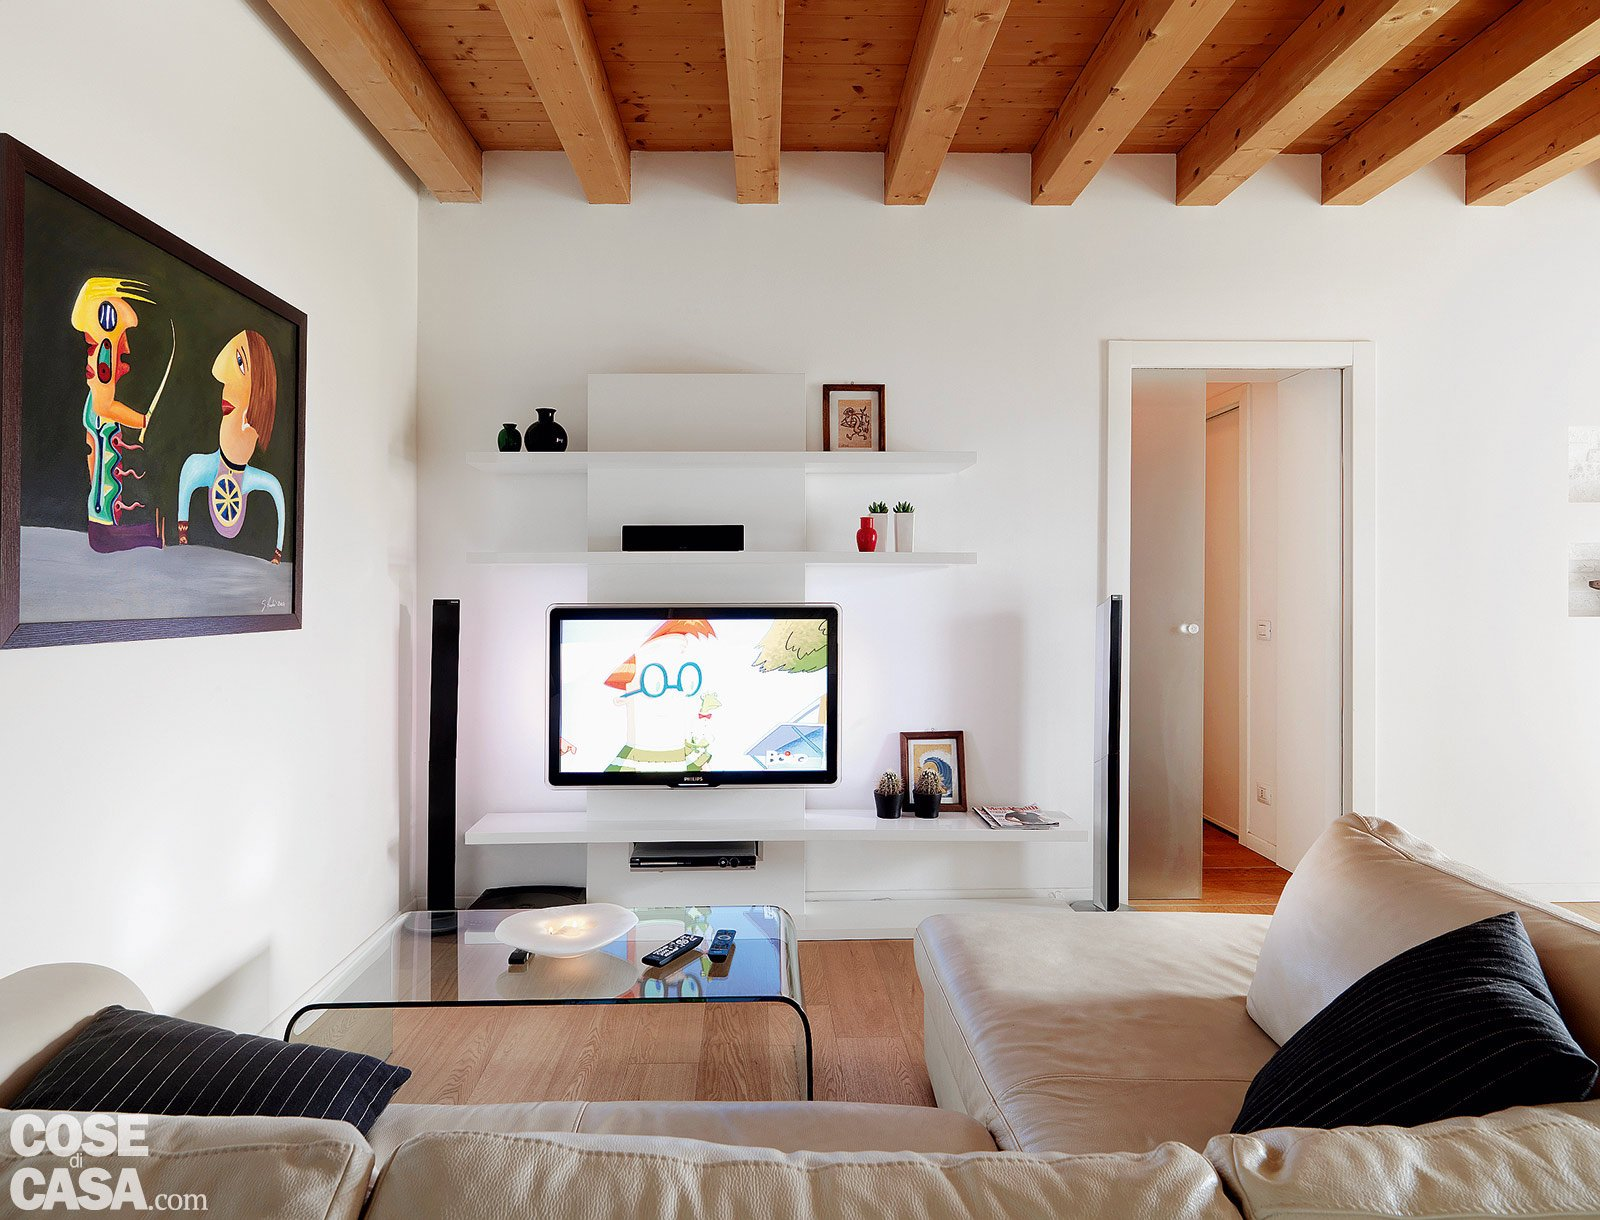 luce sopra mobile : Casa: con 10